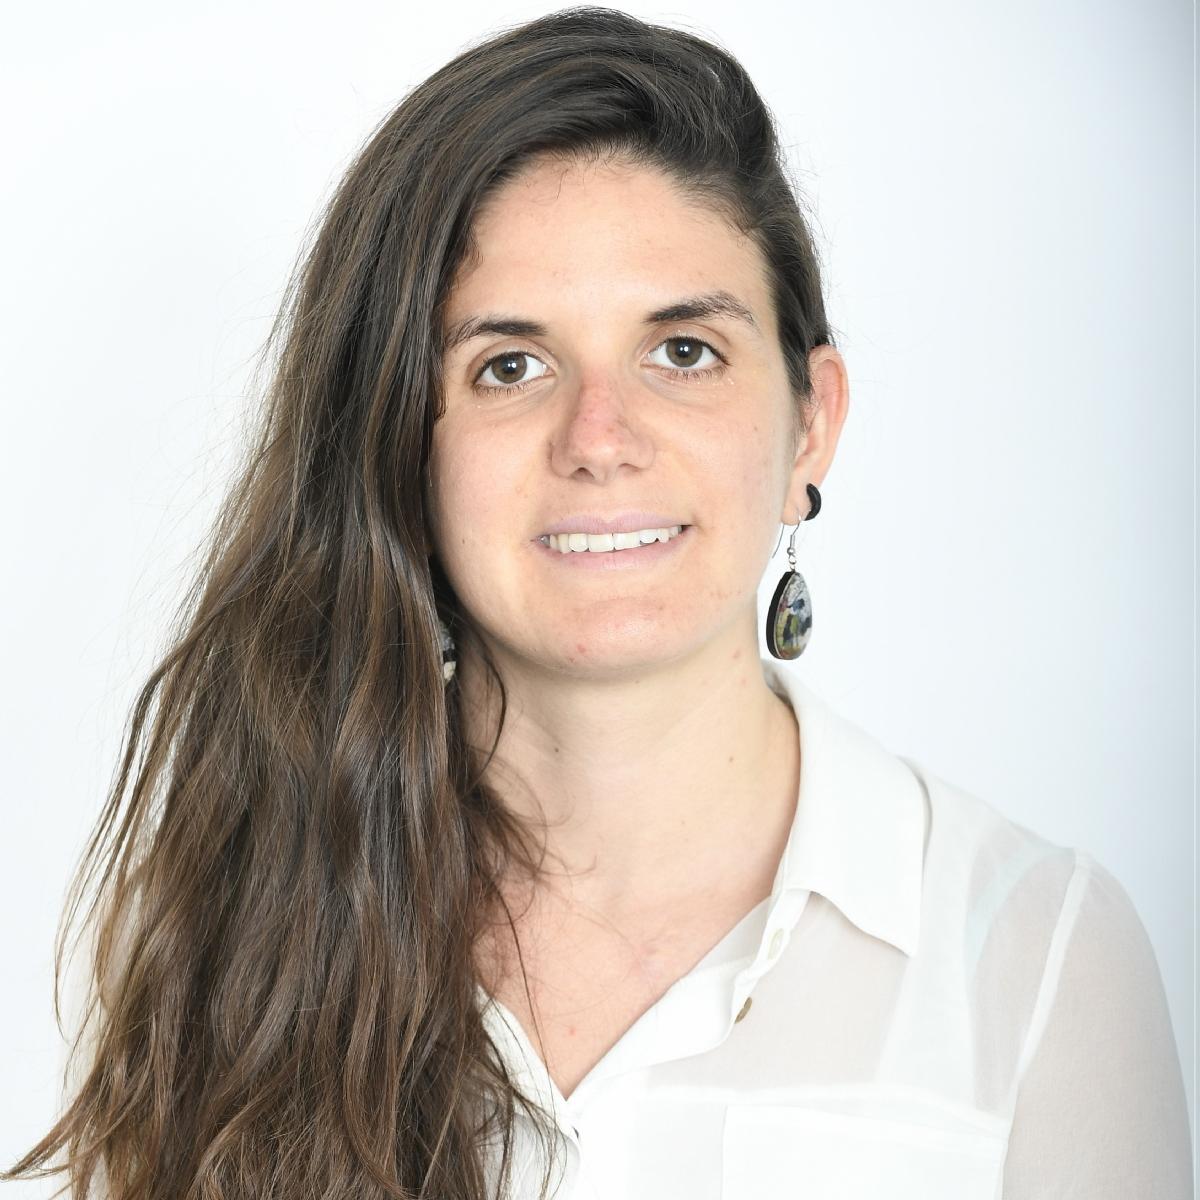 Stefania Sellitti